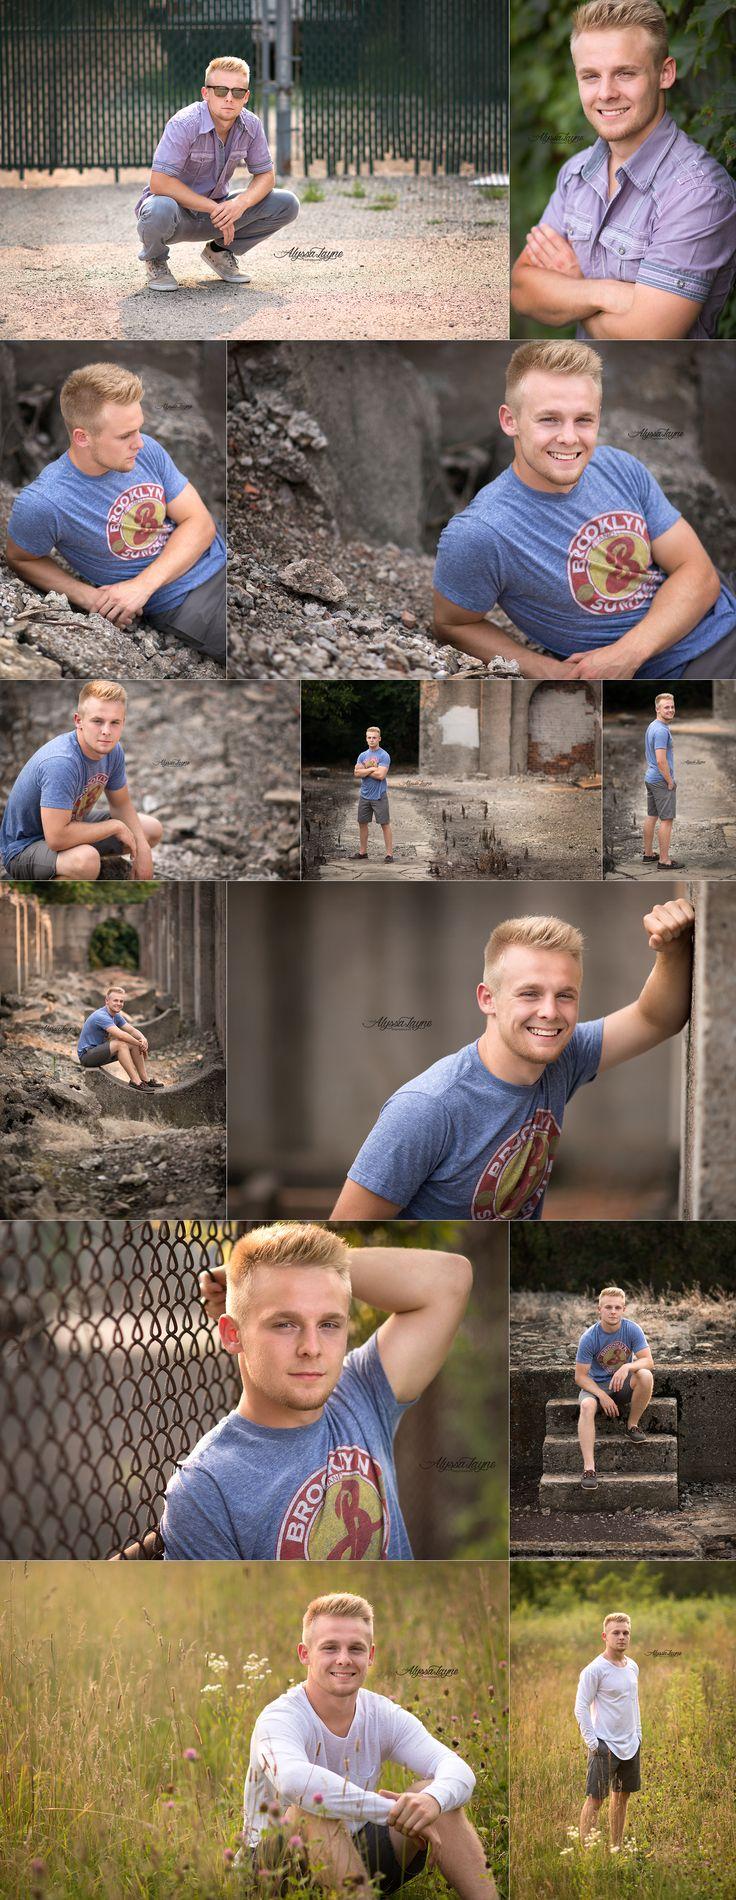 Noah   Senior Guy Poses   Senior Pictures   Chicago Senior Photographer   Alyssa Layne Photography